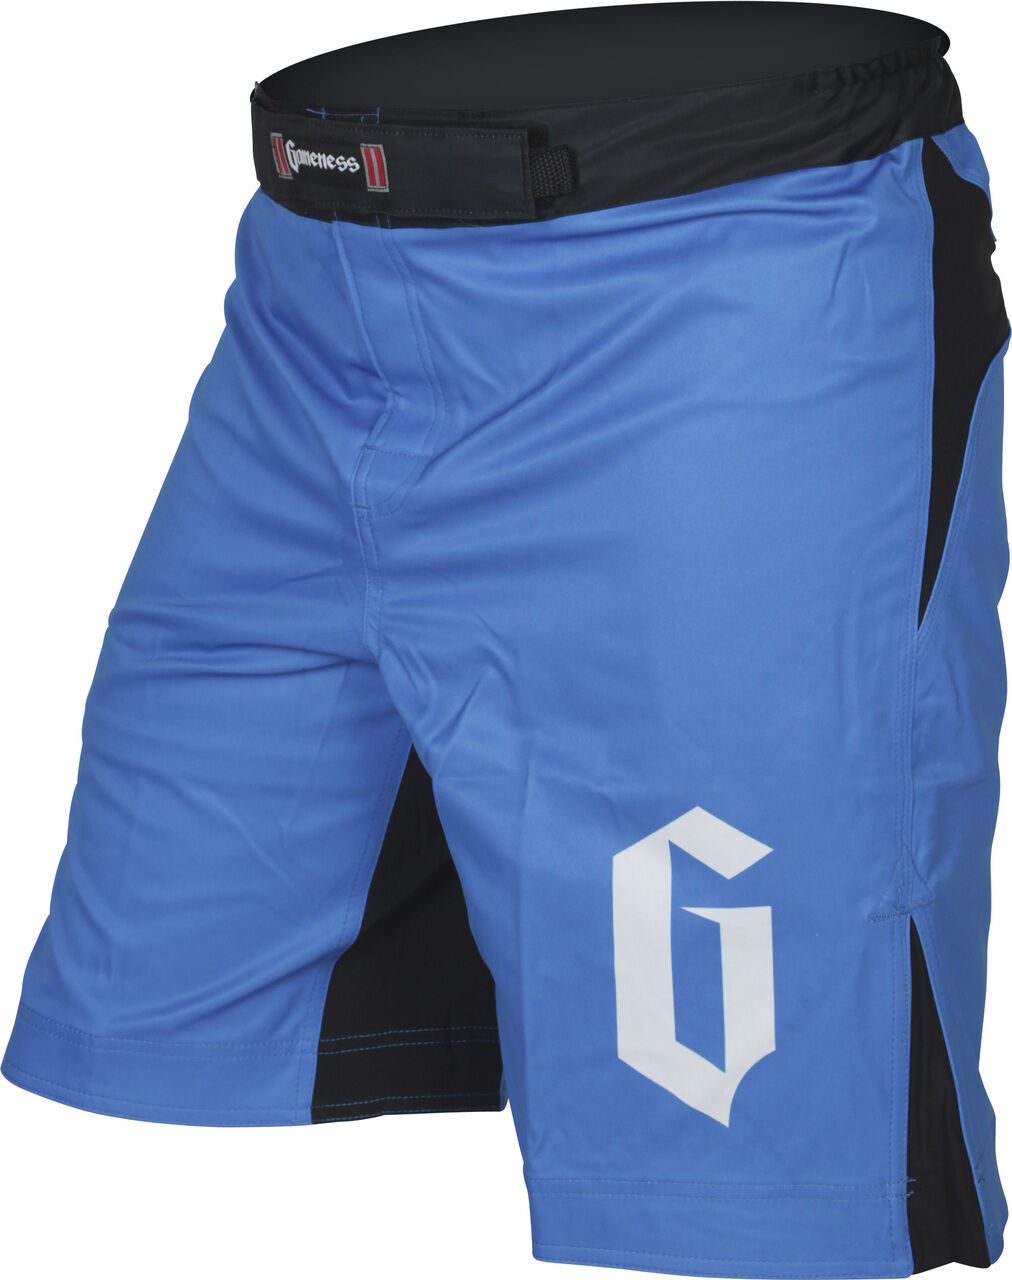 gioconess Strike Pantaloncini Blu Nero No Gi Bjj Grappling Mma Lotta Ju Jitsu